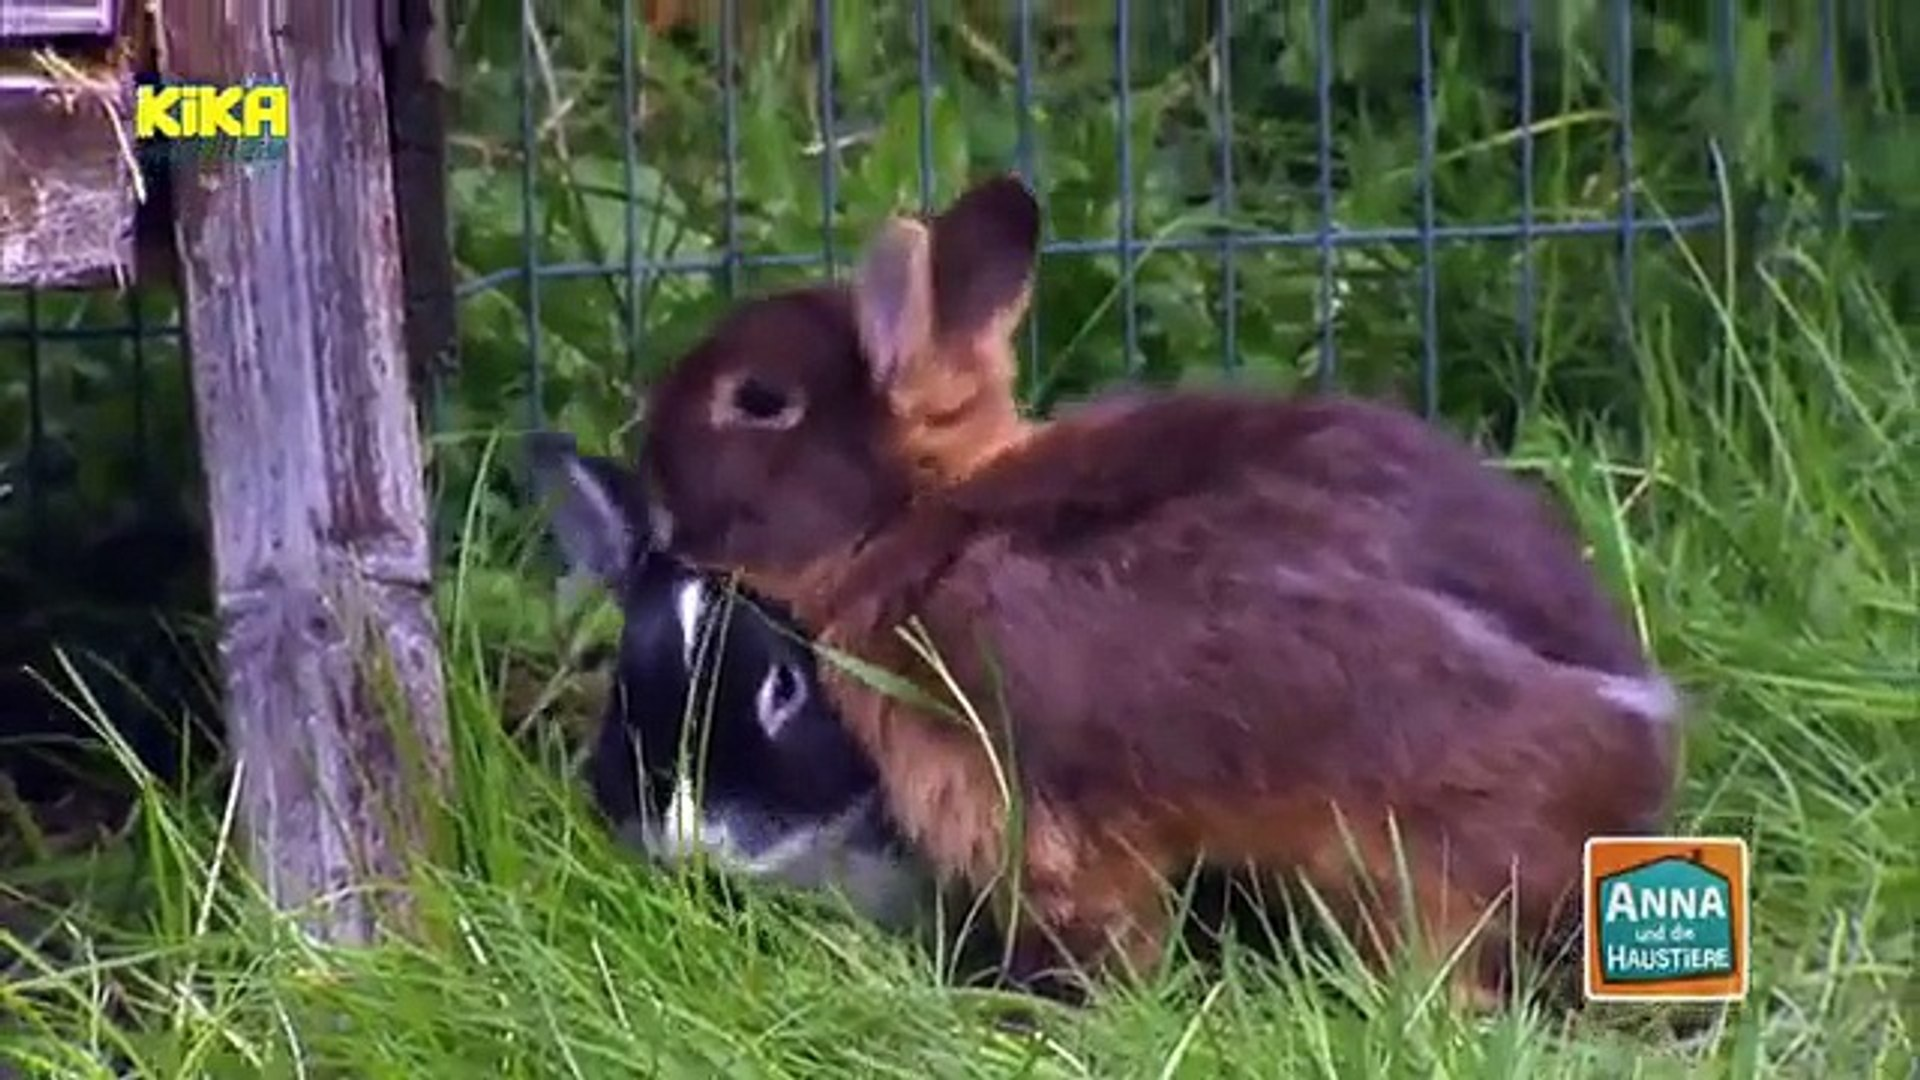 Kika Live Dein Hobby Kaninchenfotografie Mehr Auf Kika De